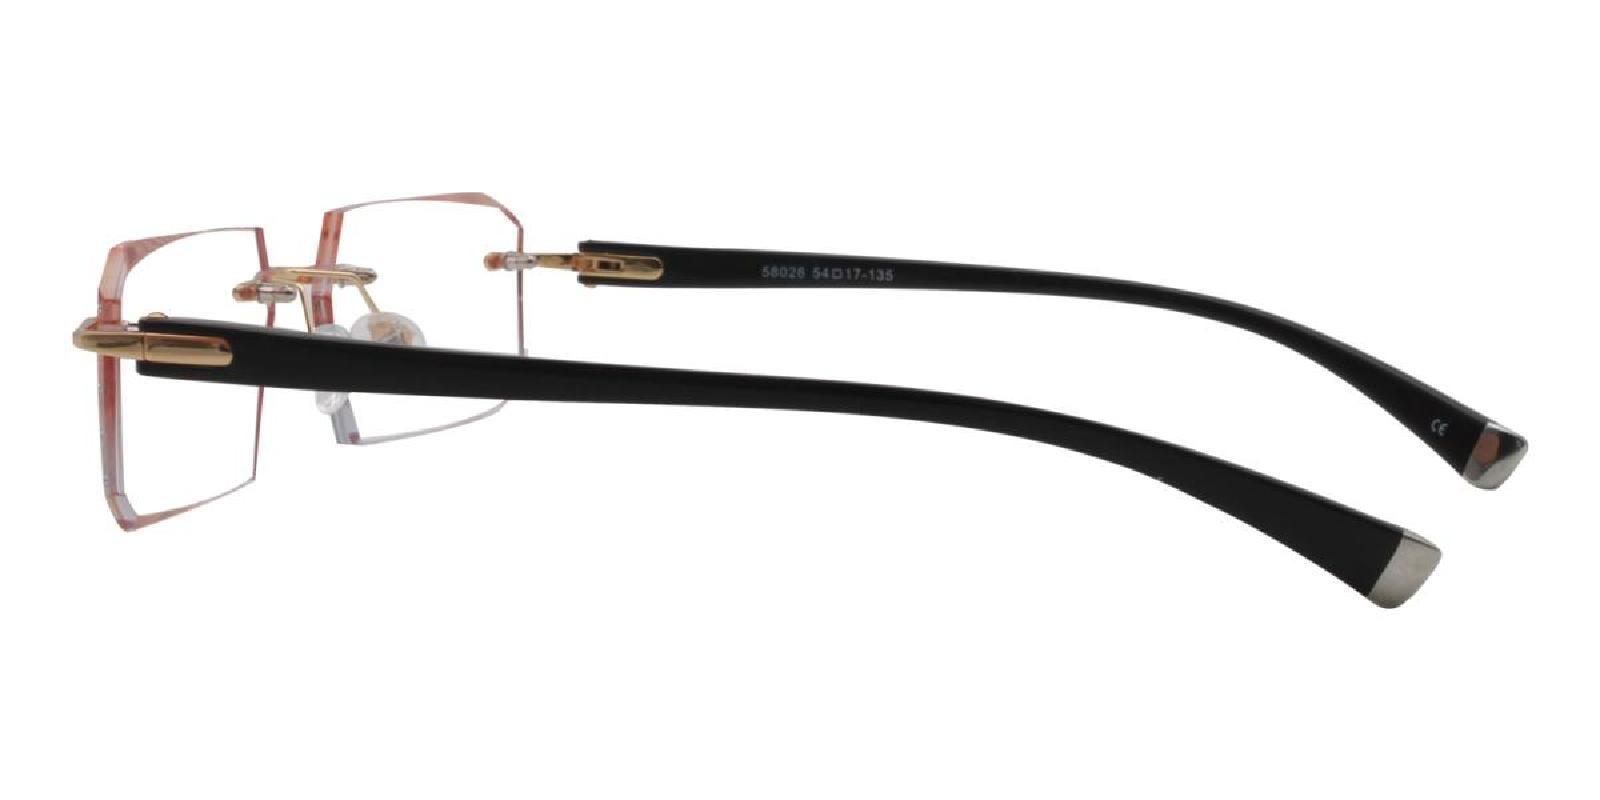 Pandoco-Gold-Varieties-Titanium-Eyeglasses-additional3